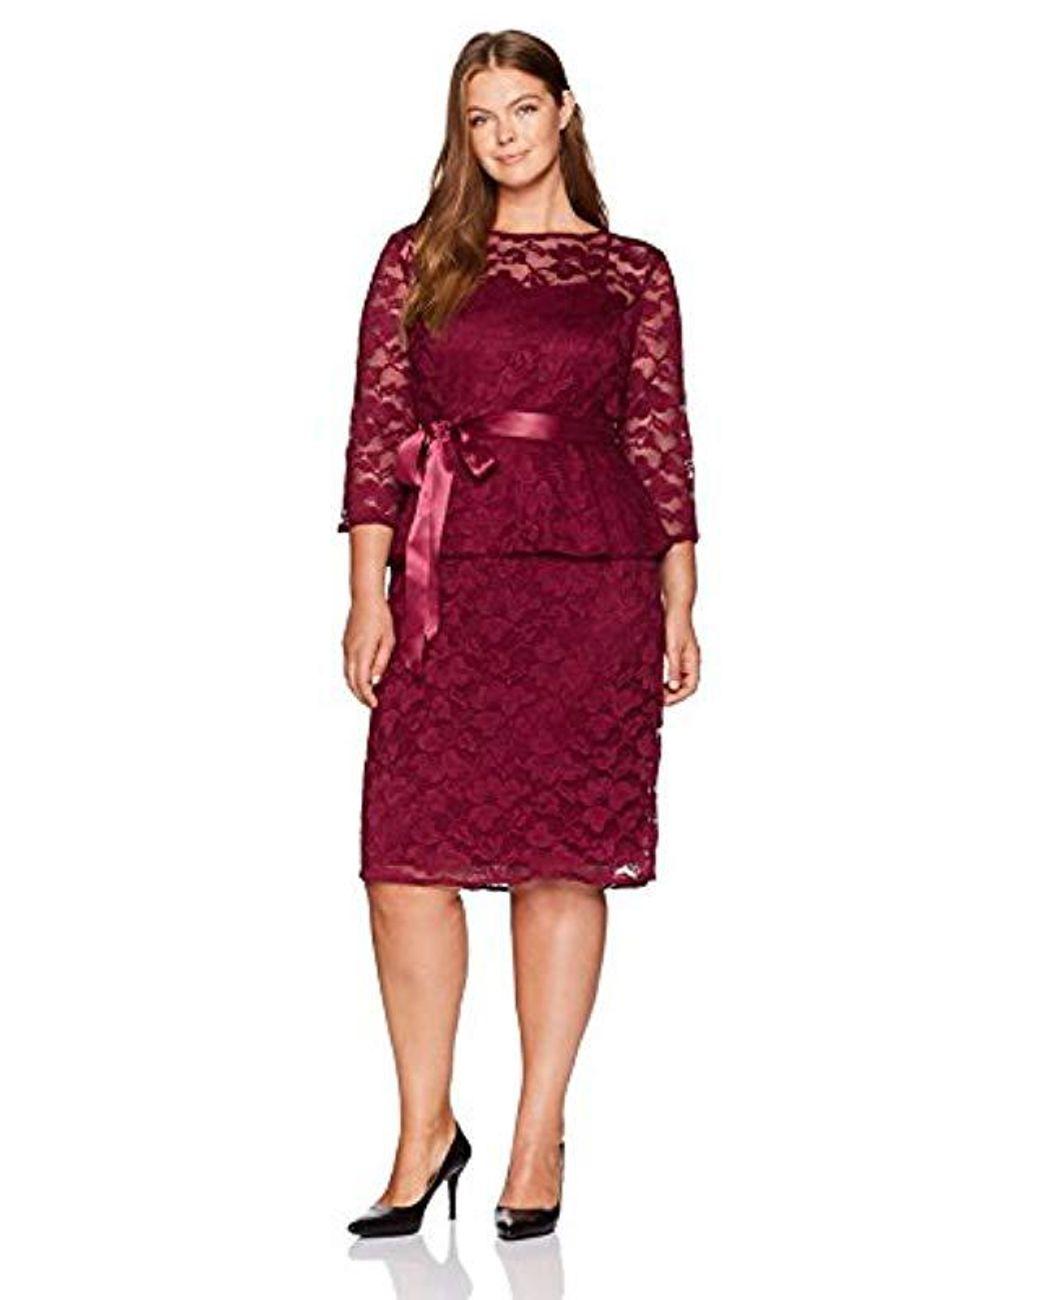 Chetta B Plus Size 3/4 Sleeve Lace Peplum Dress in Garnet ...